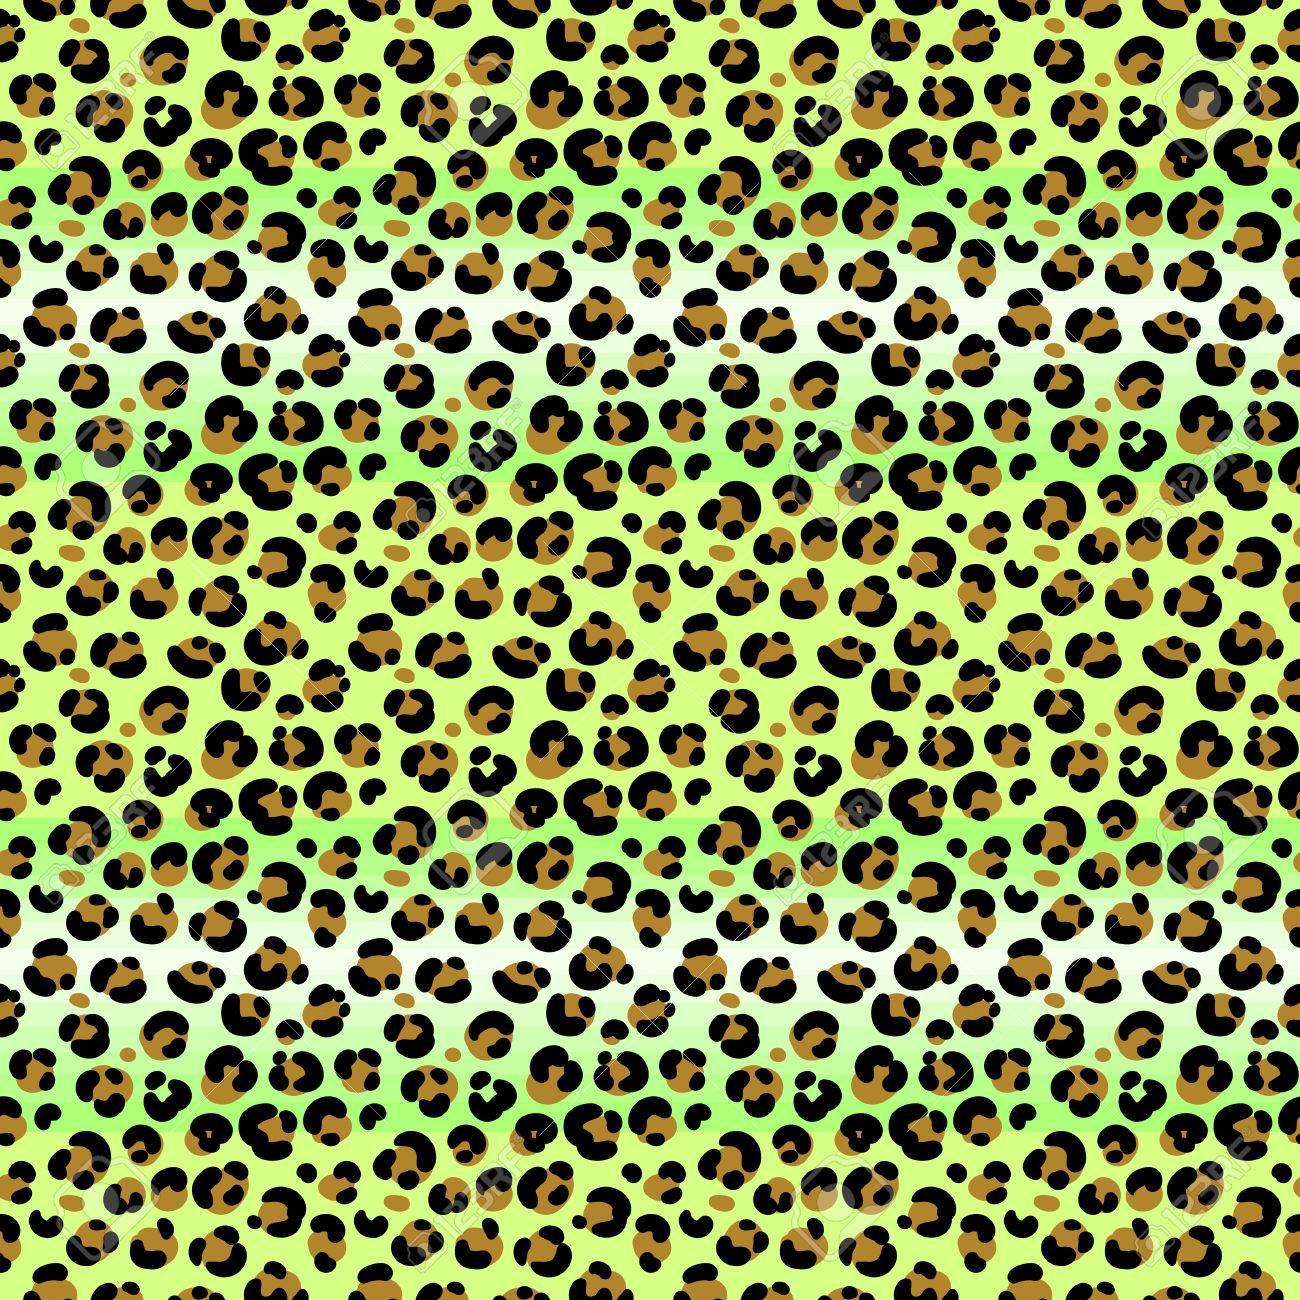 yellow green spots on skin